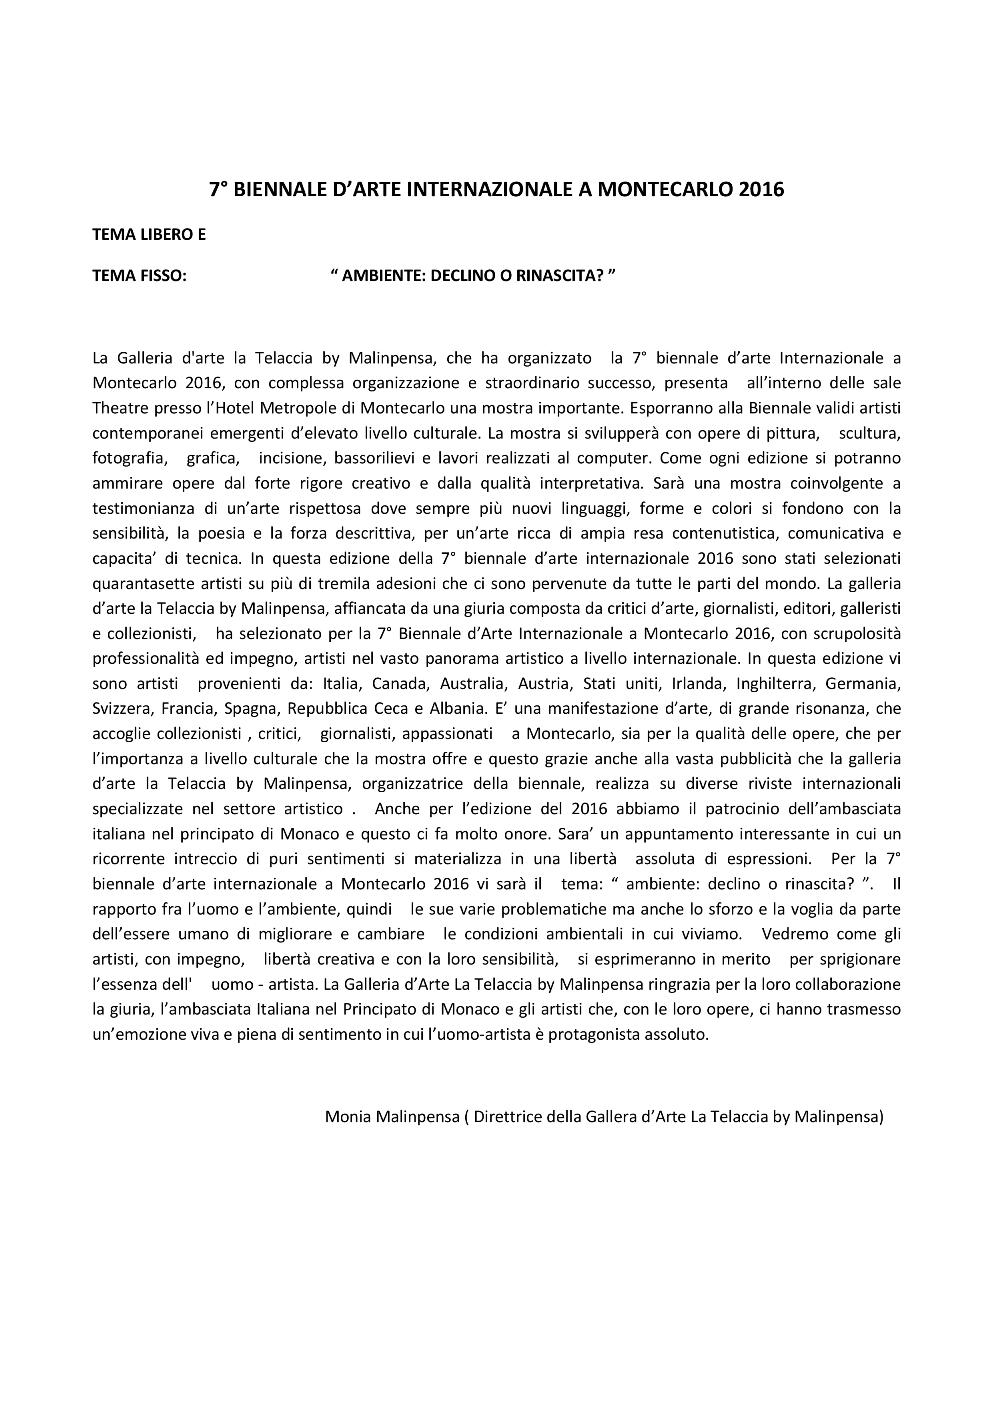 7° BIENNALE D'ARTE INTERNAZIONALE A MONTECARLO 2016- pdf.jpg